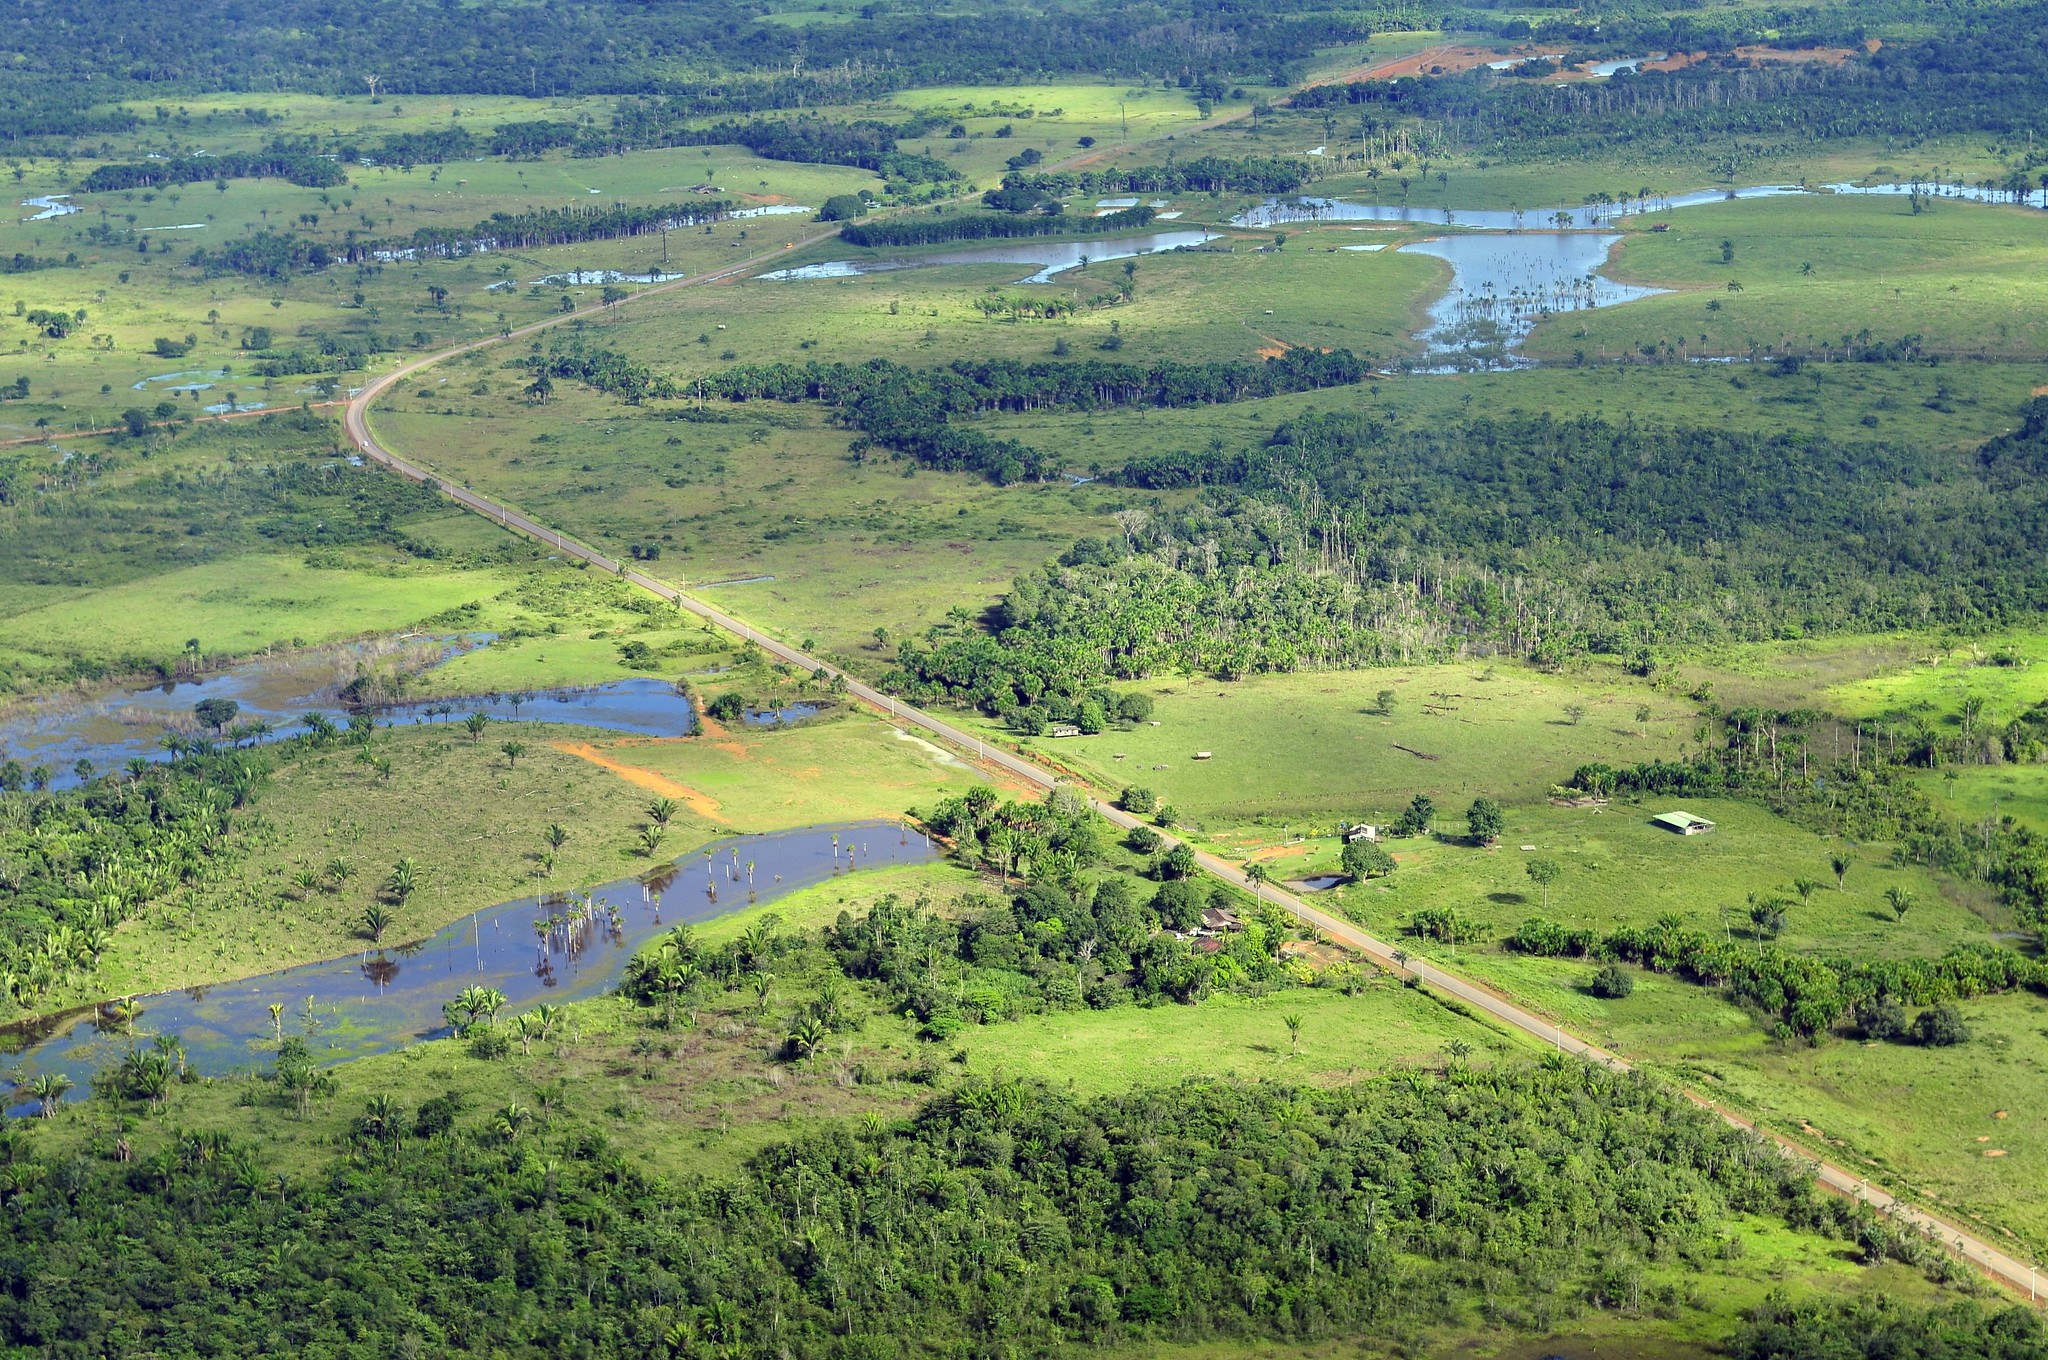 The Amazon rainforest near Manaus, Brazil